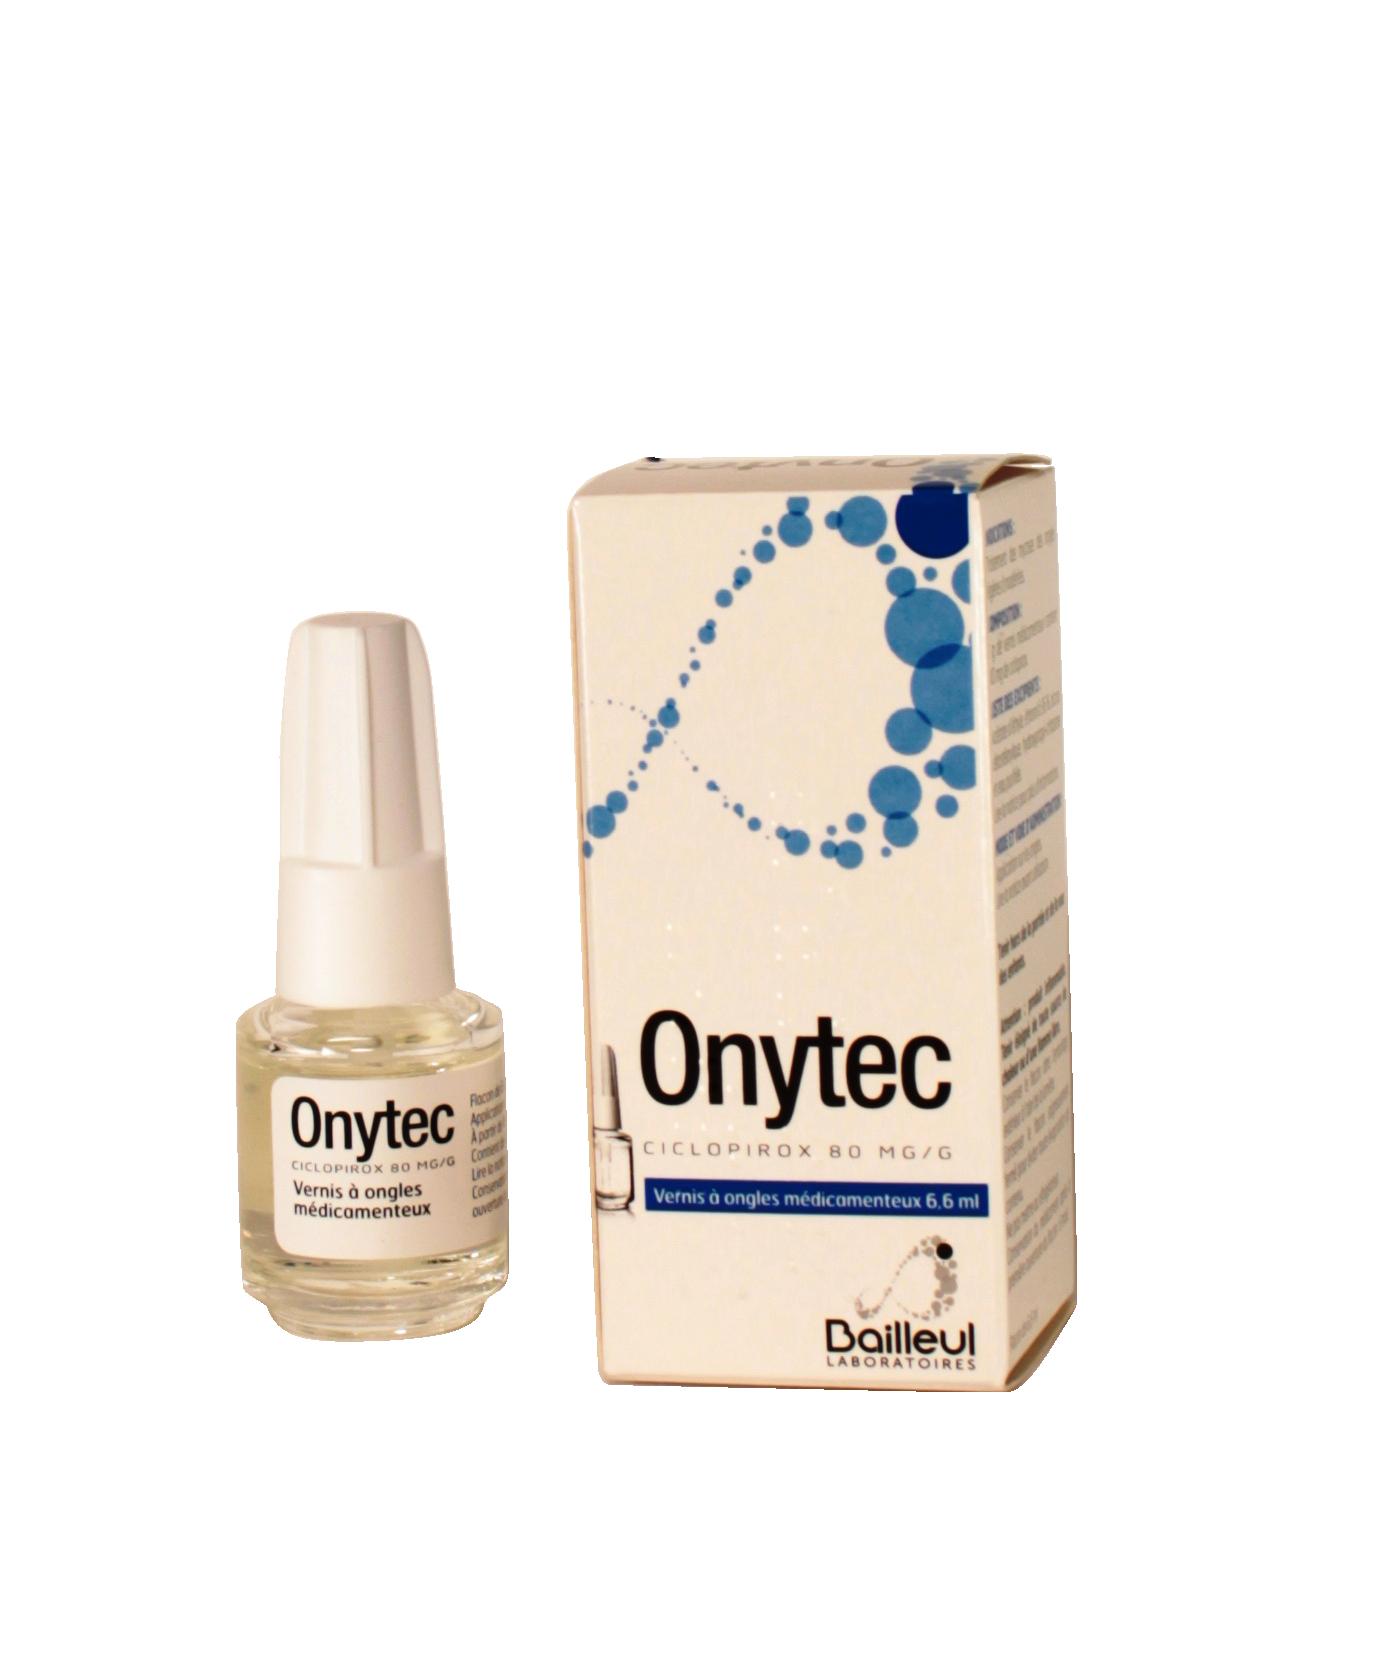 Onytec Vernis Bailleul Illicopharma Mycoses 6 6ml Médicament QshdCrtx